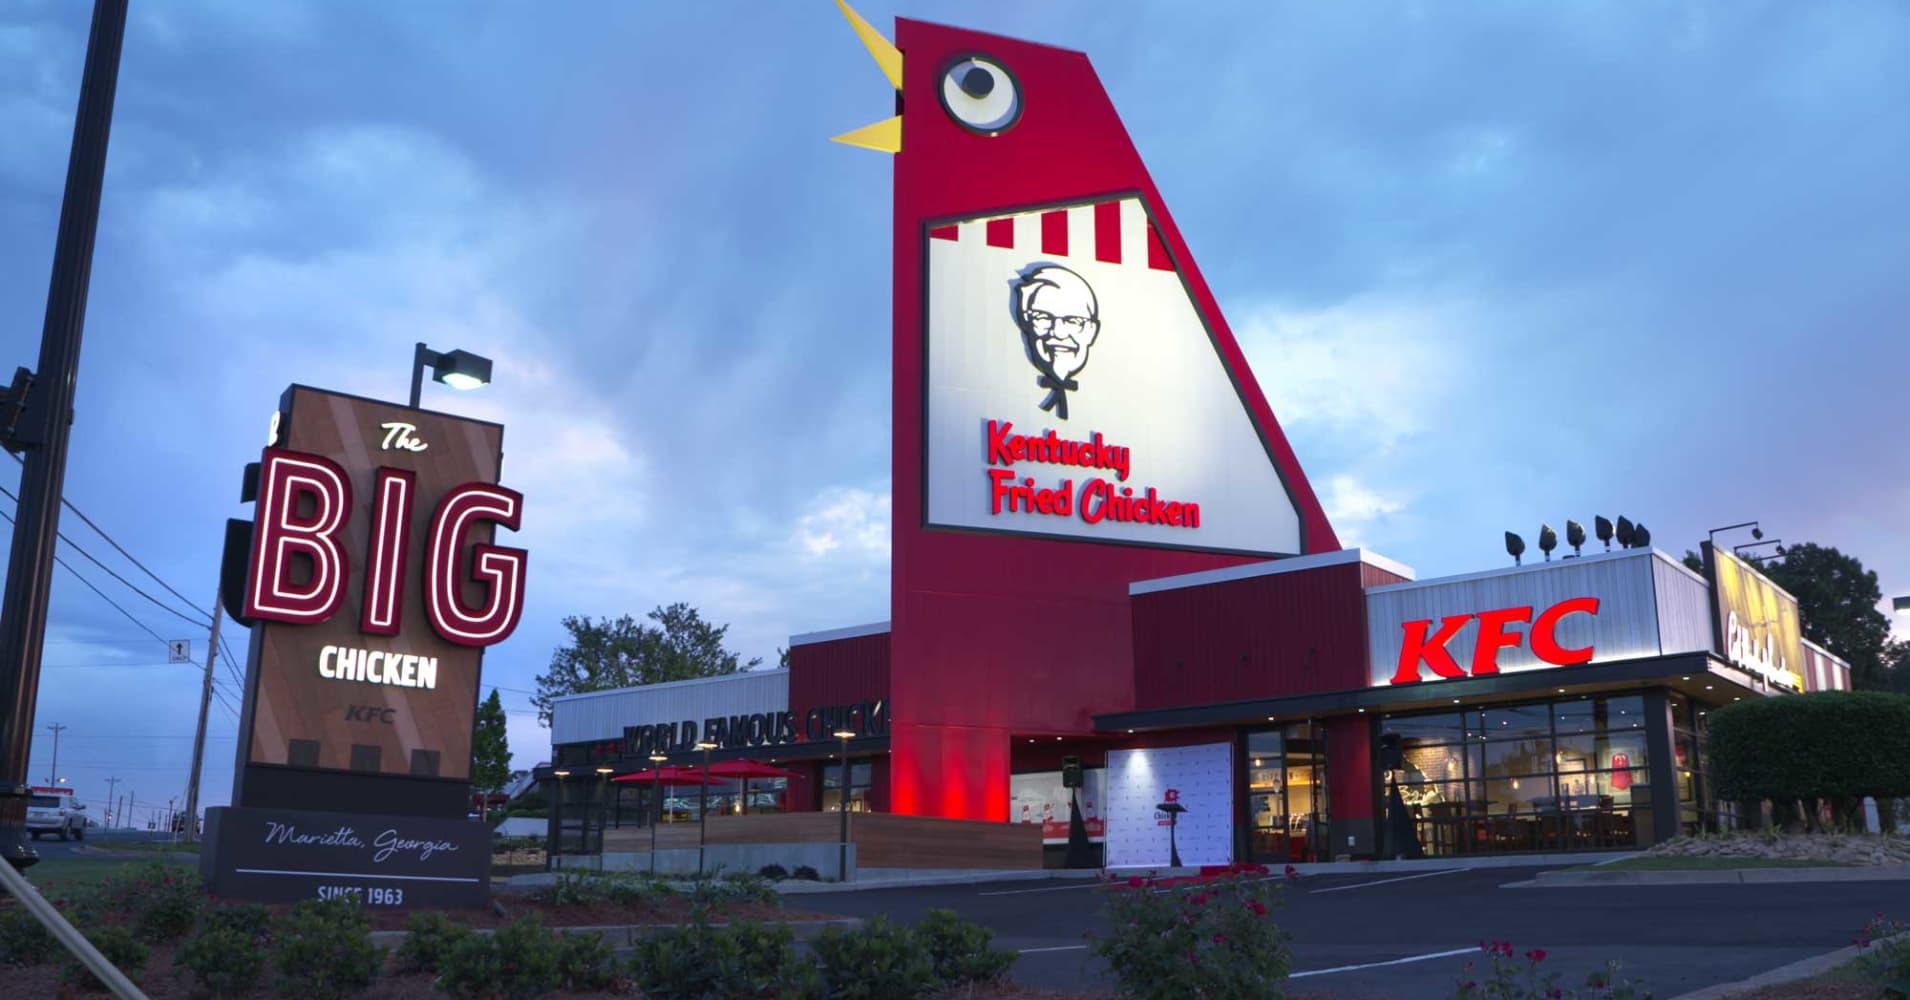 kfc spent 2 million to revamp this one restaurant